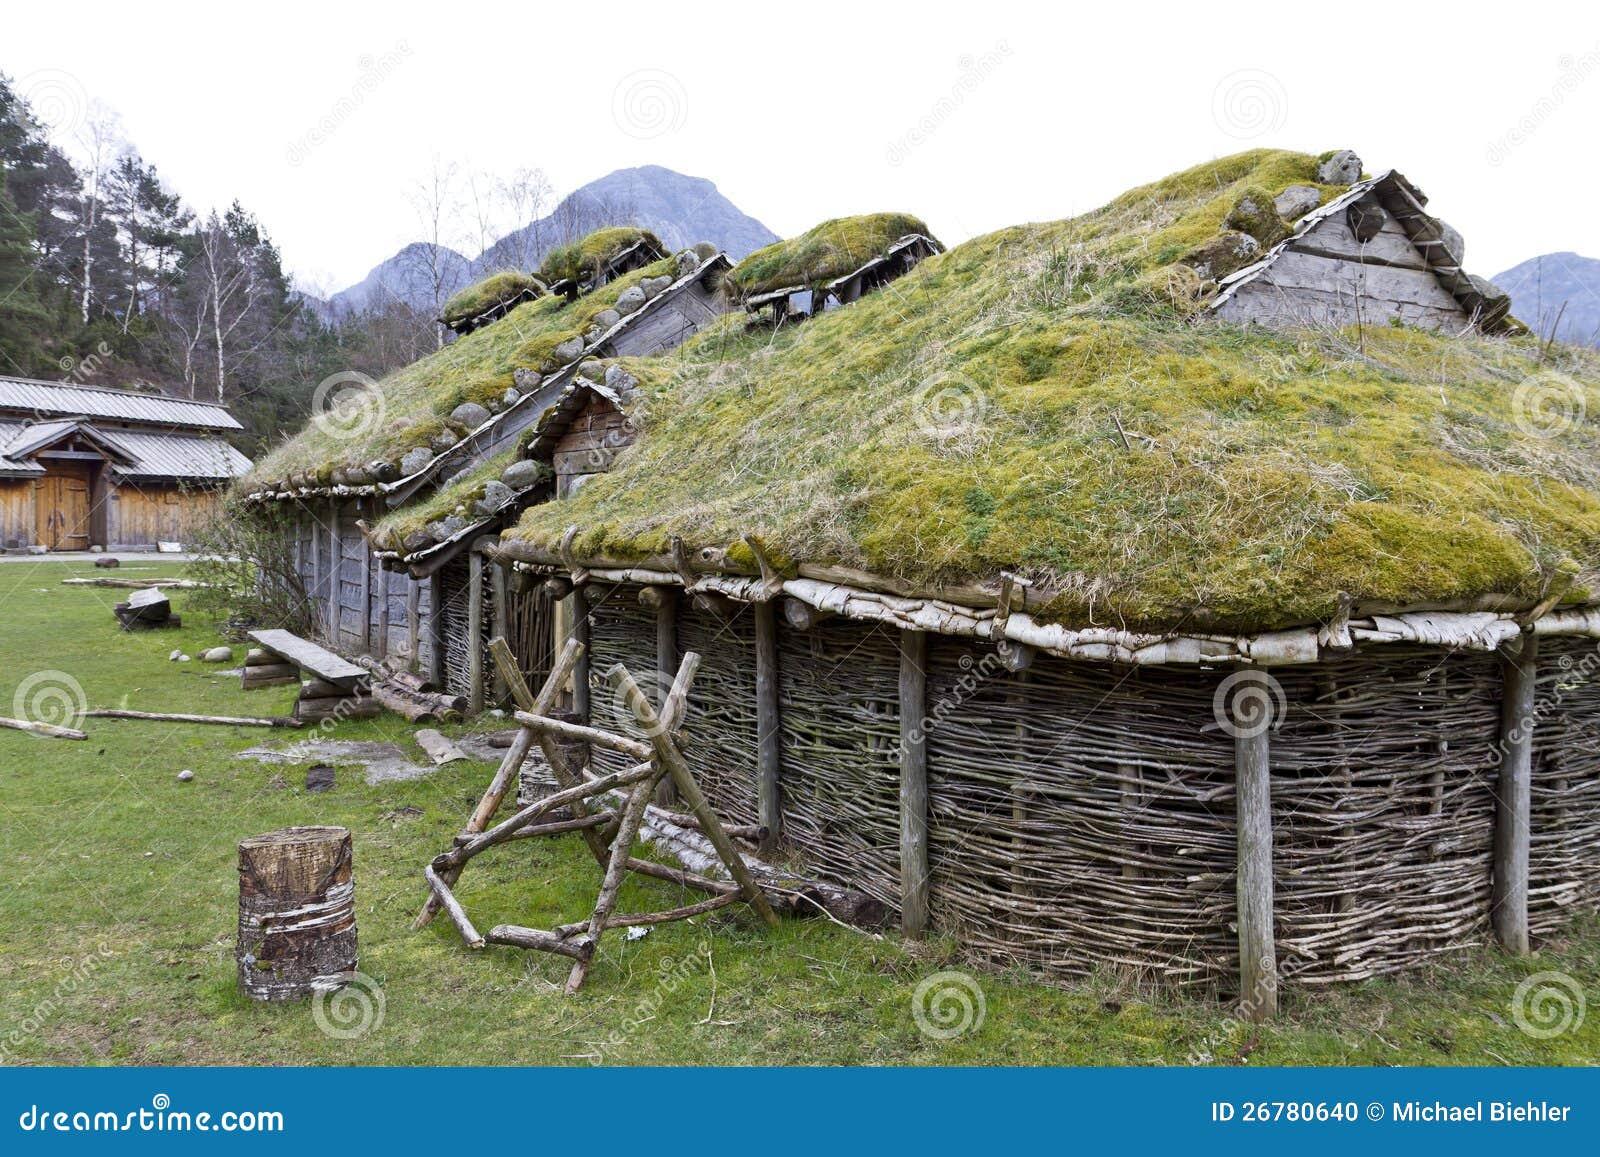 Rebuild Historic House In Norway Stock Photo Image 26780640